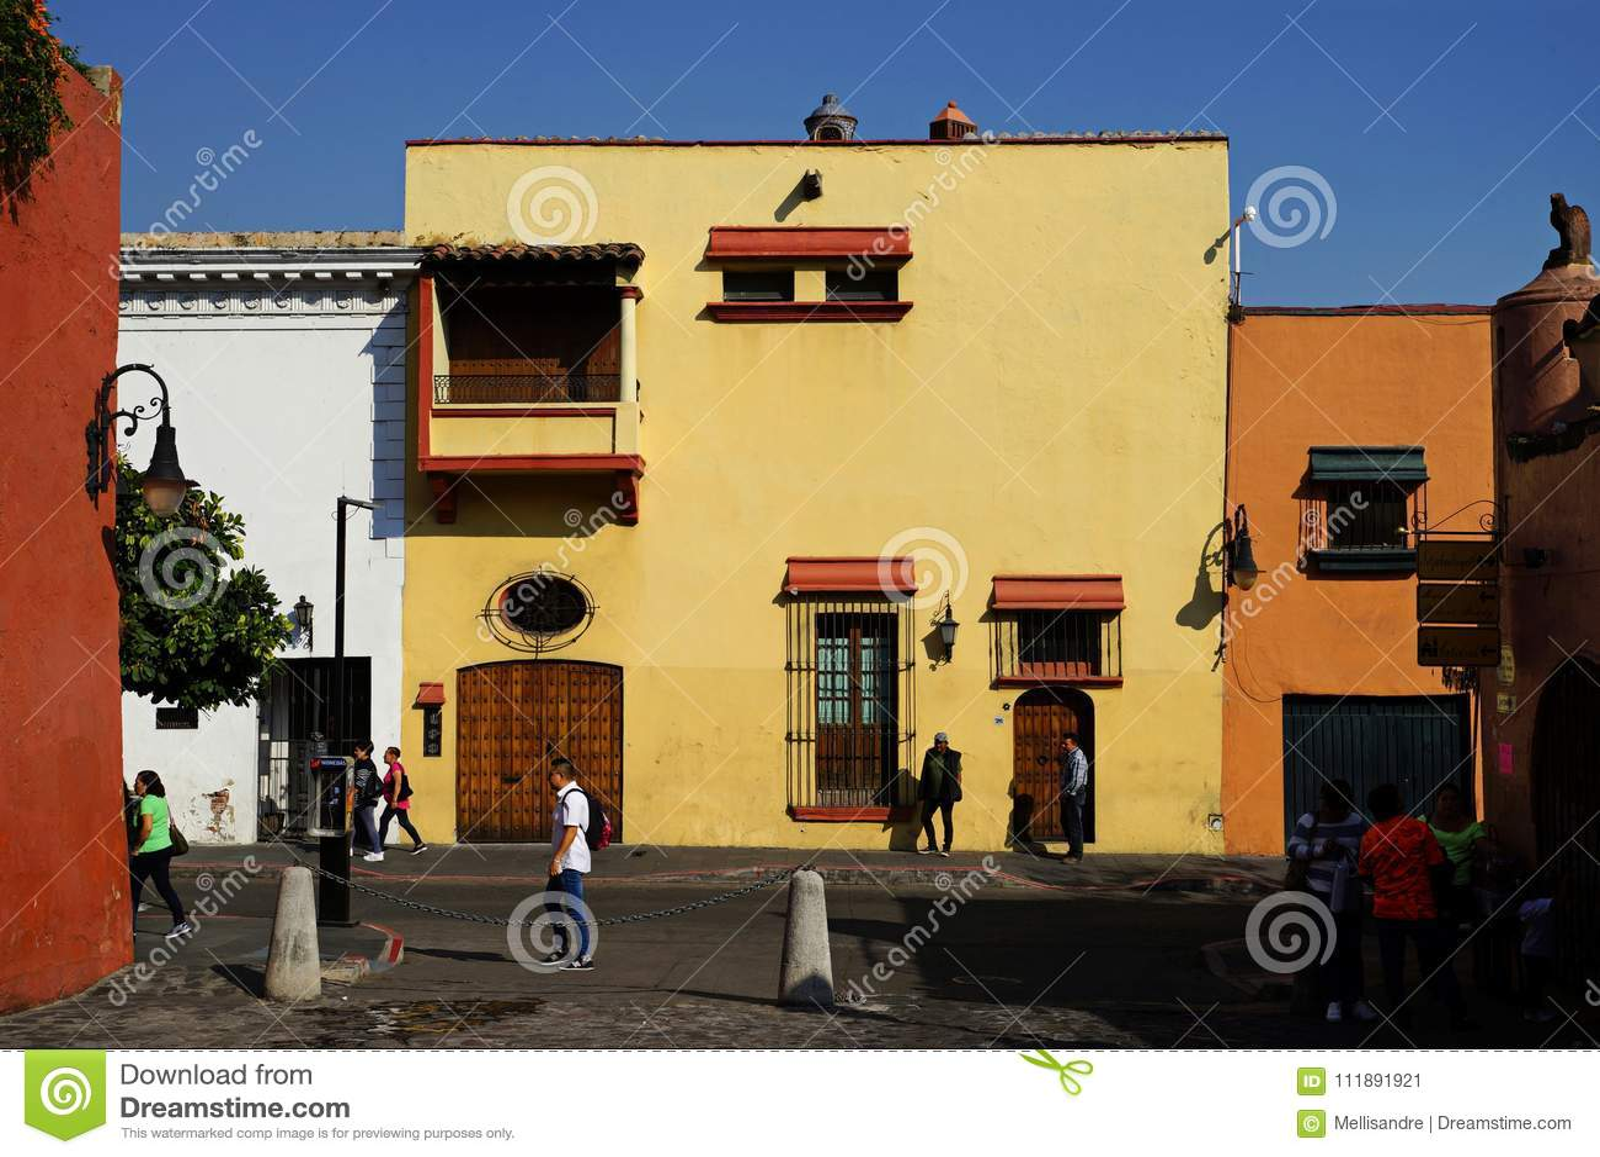 Ulica w Cuernavaca, Meksyk